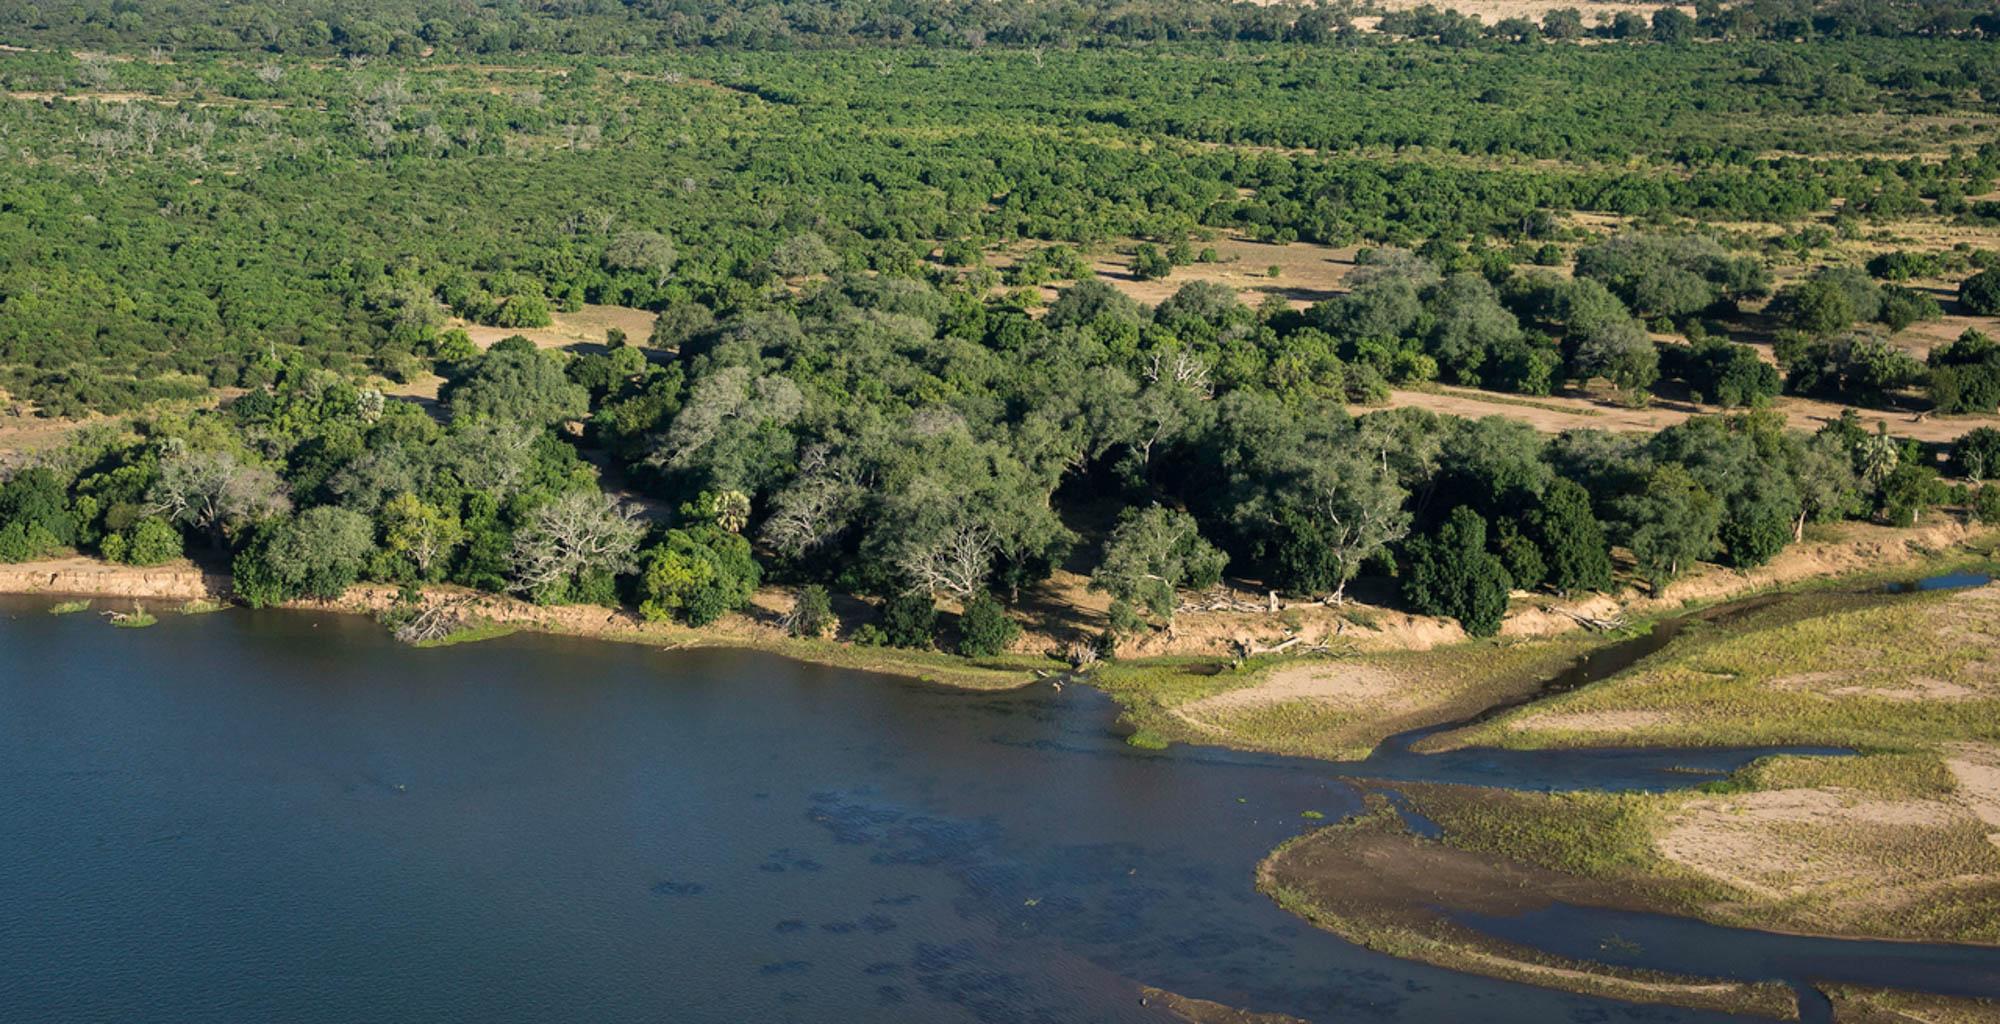 Zimbabwe-Mana-Pools-Aerial